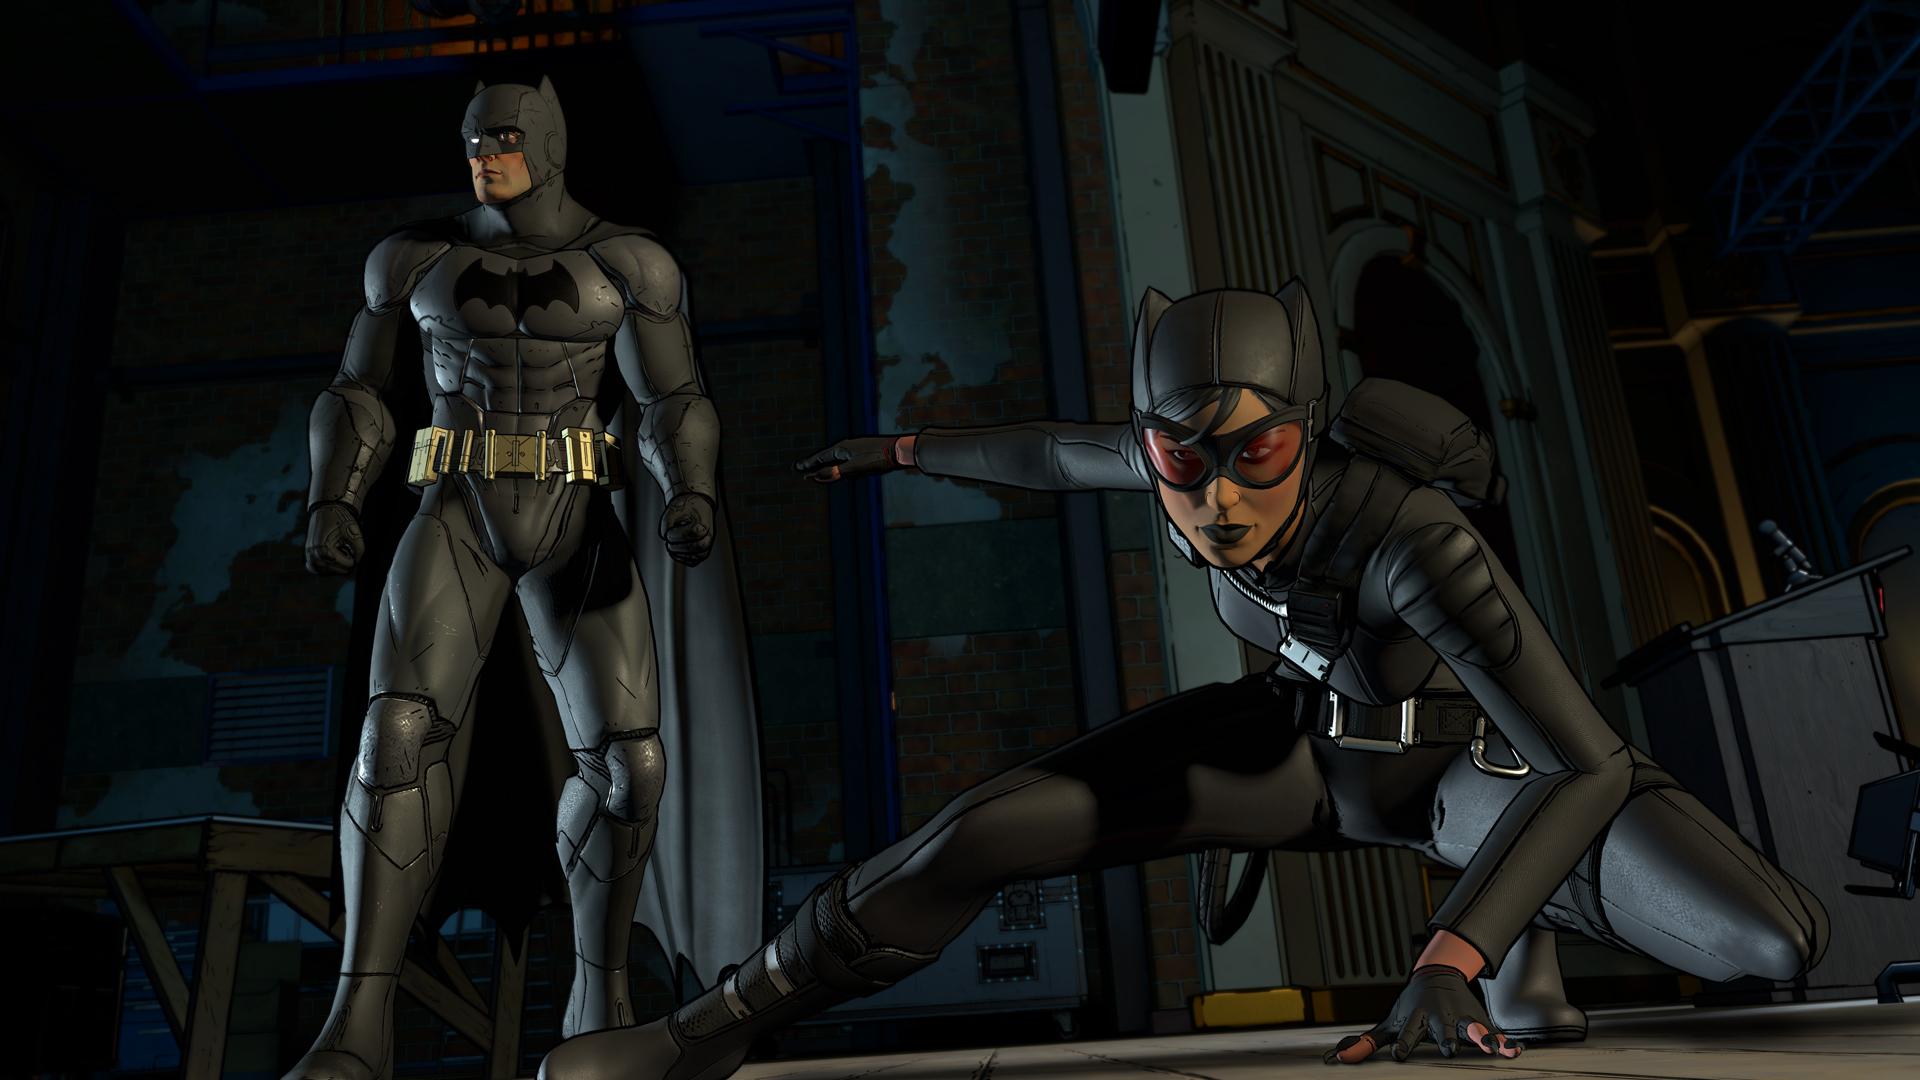 batman-telltale-series-ep-2-enfants-darkham-screen